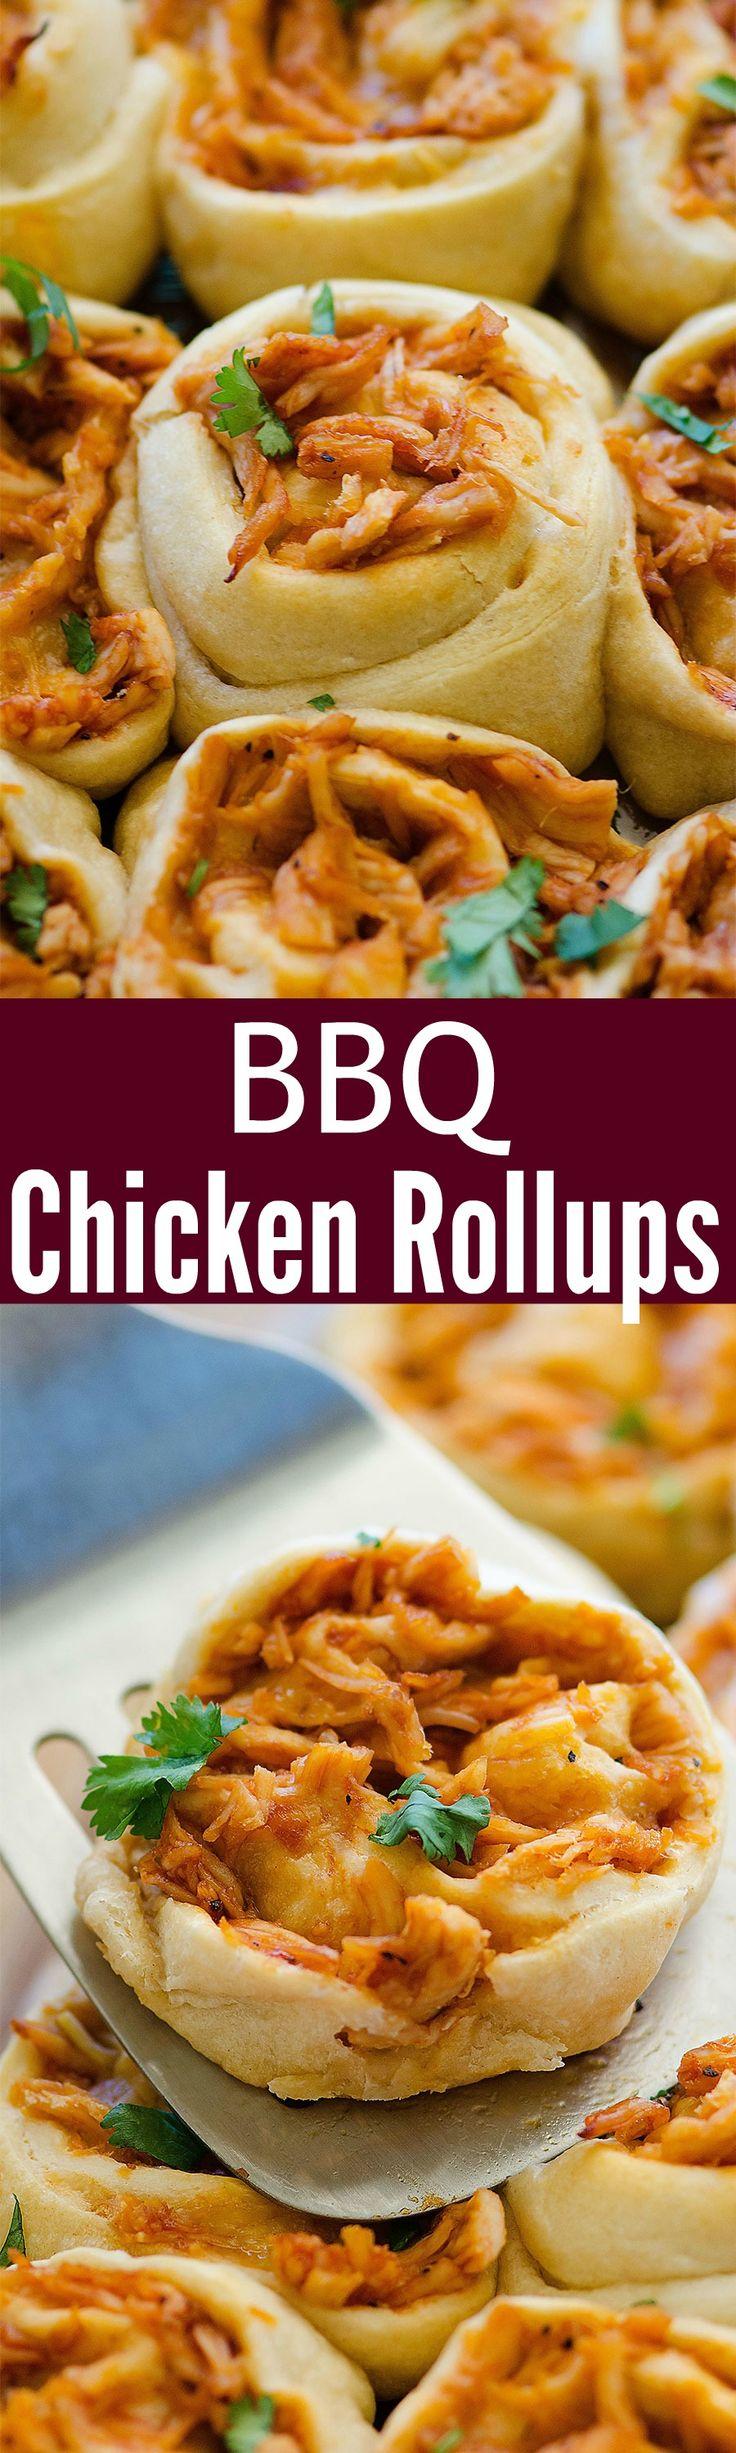 Absolutely #YUMMY #BBQ Chicken Roll-Ups Recipe!!!   ~XOX #MomAndSonCookingTeam